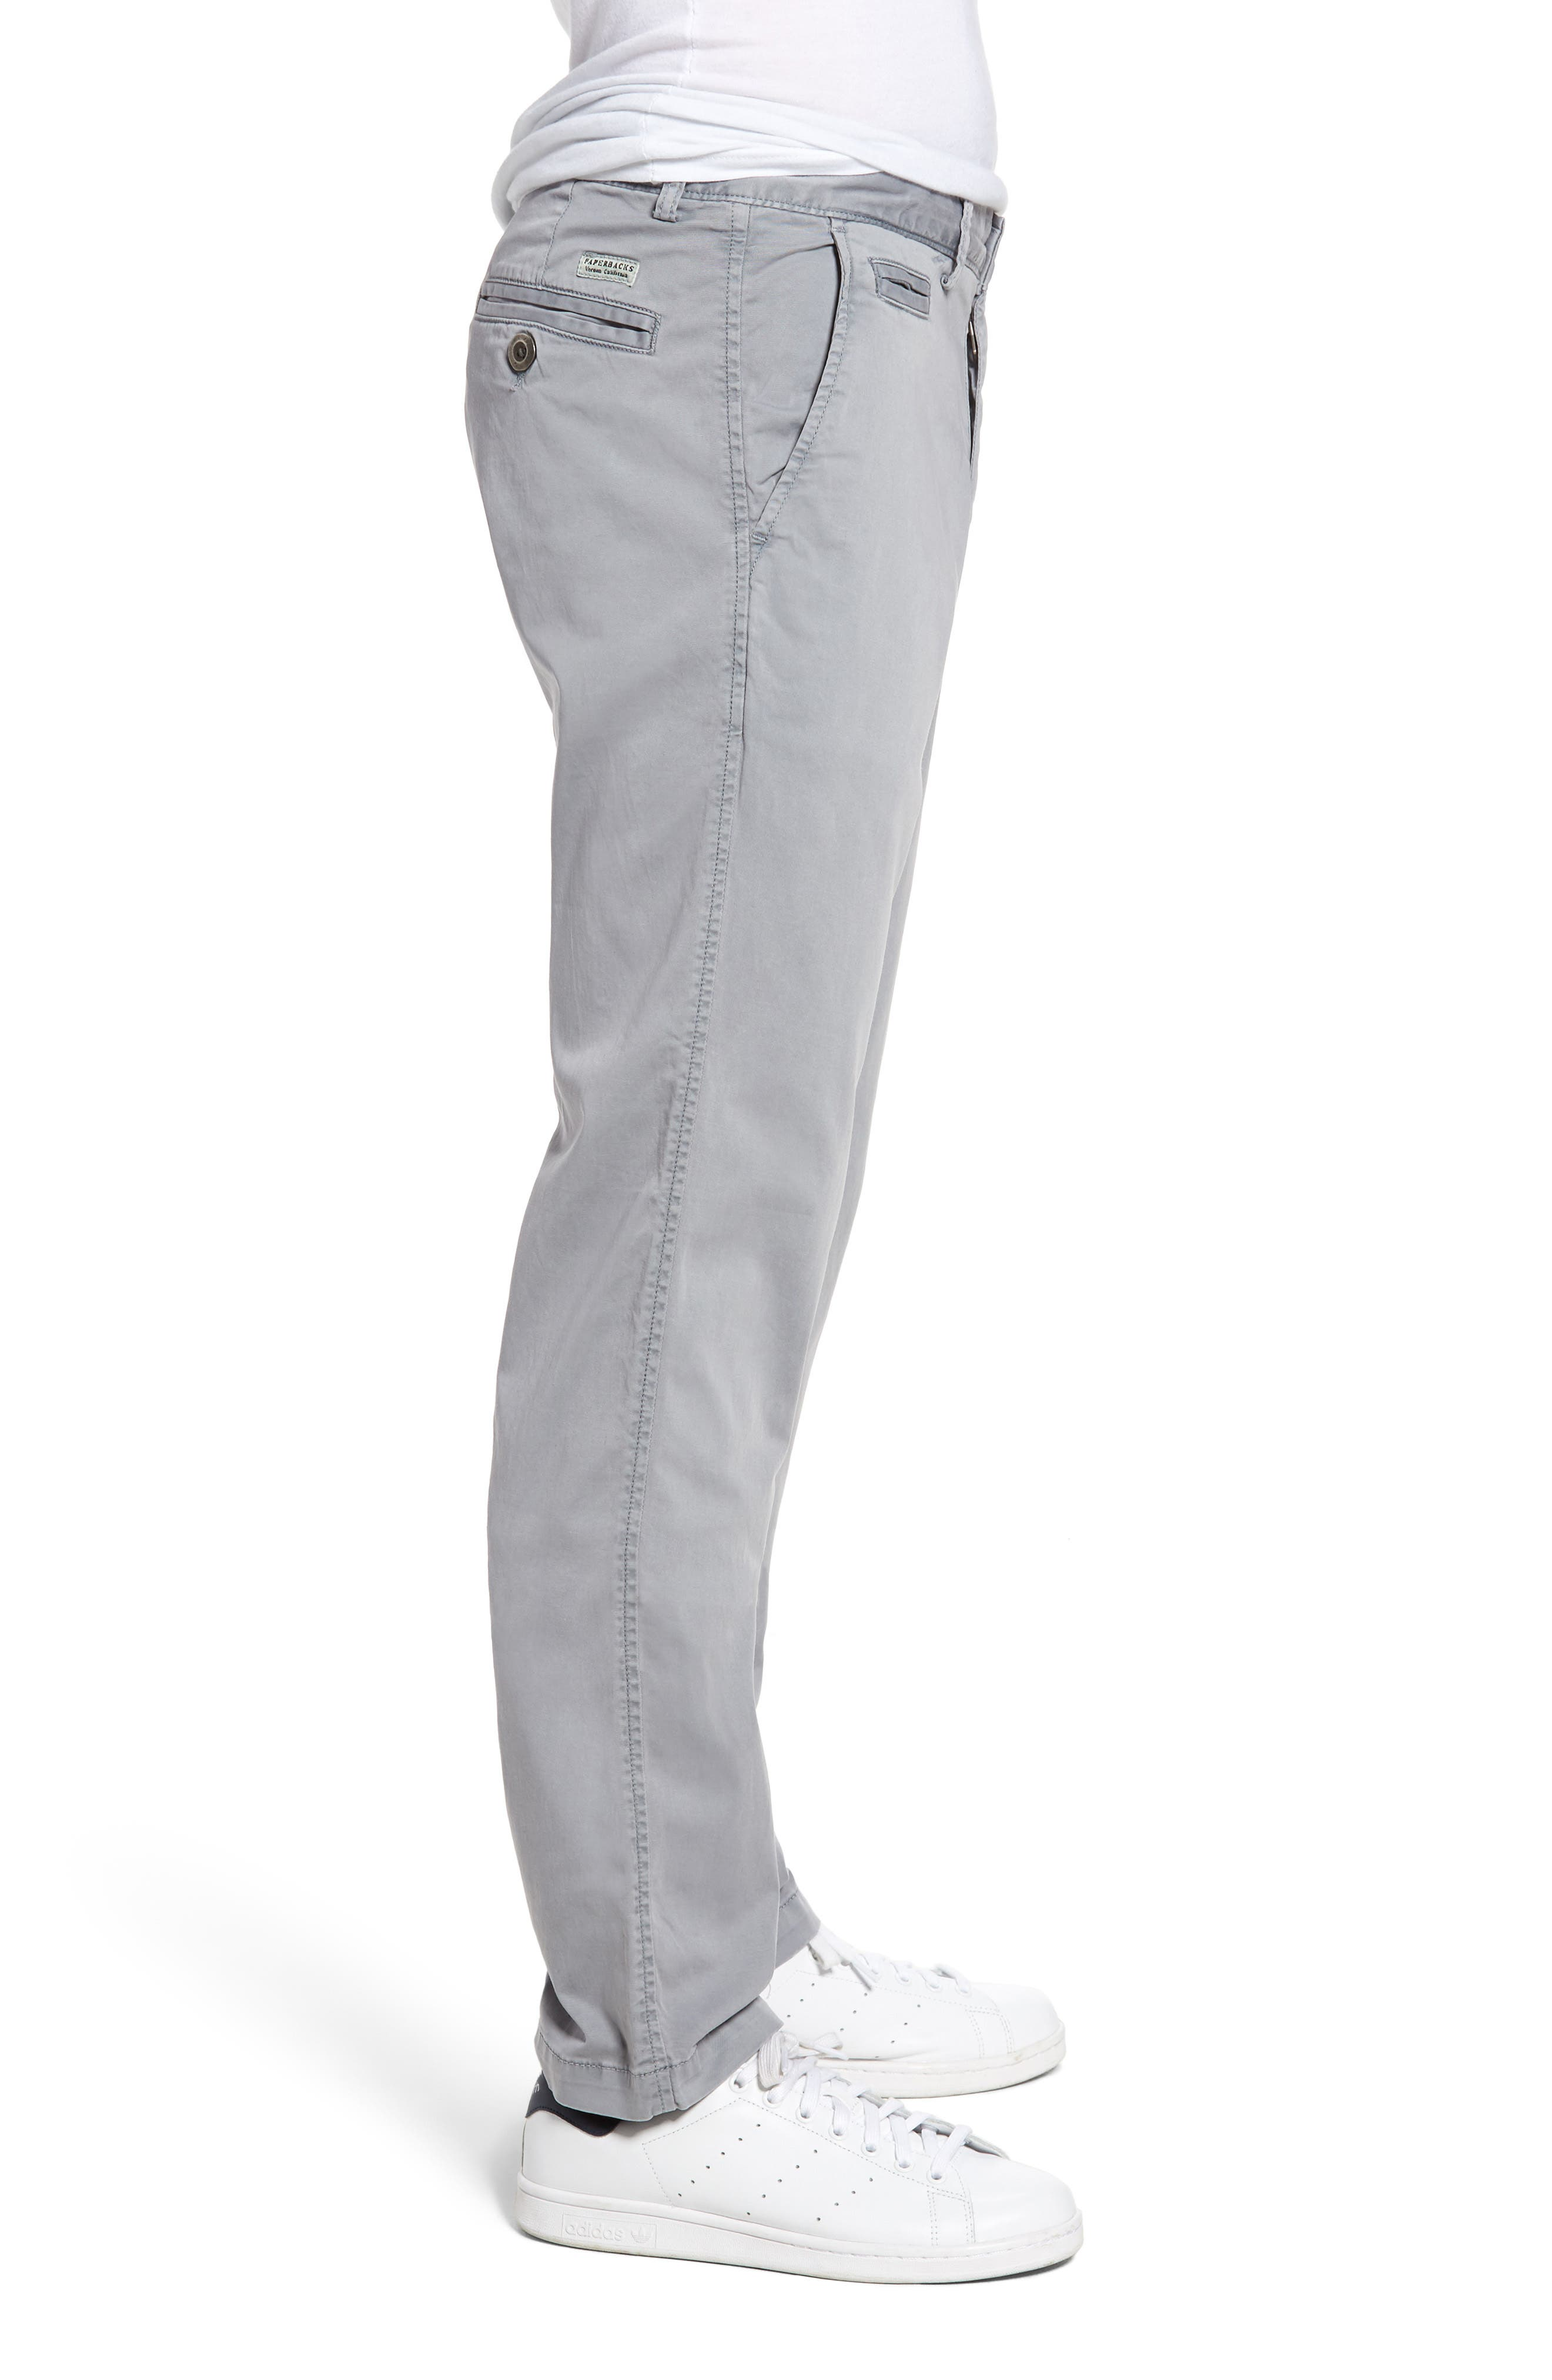 Belmont Stretch Chino Pants,                             Alternate thumbnail 3, color,                             020